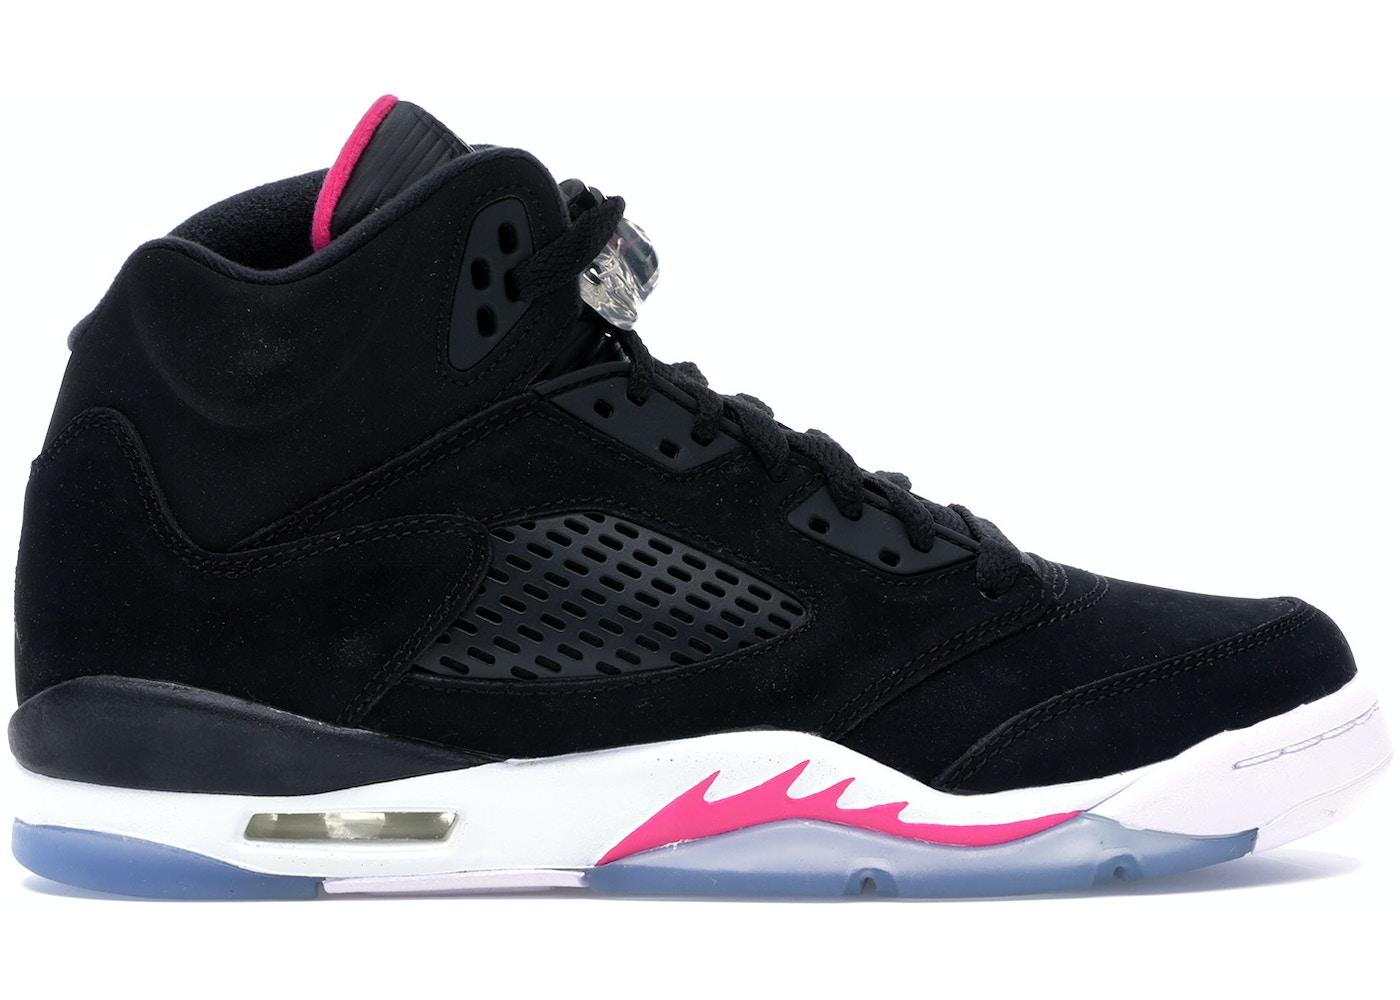 meet 74105 be732 Jordan 5 Retro Black Deadly Pink (GS)